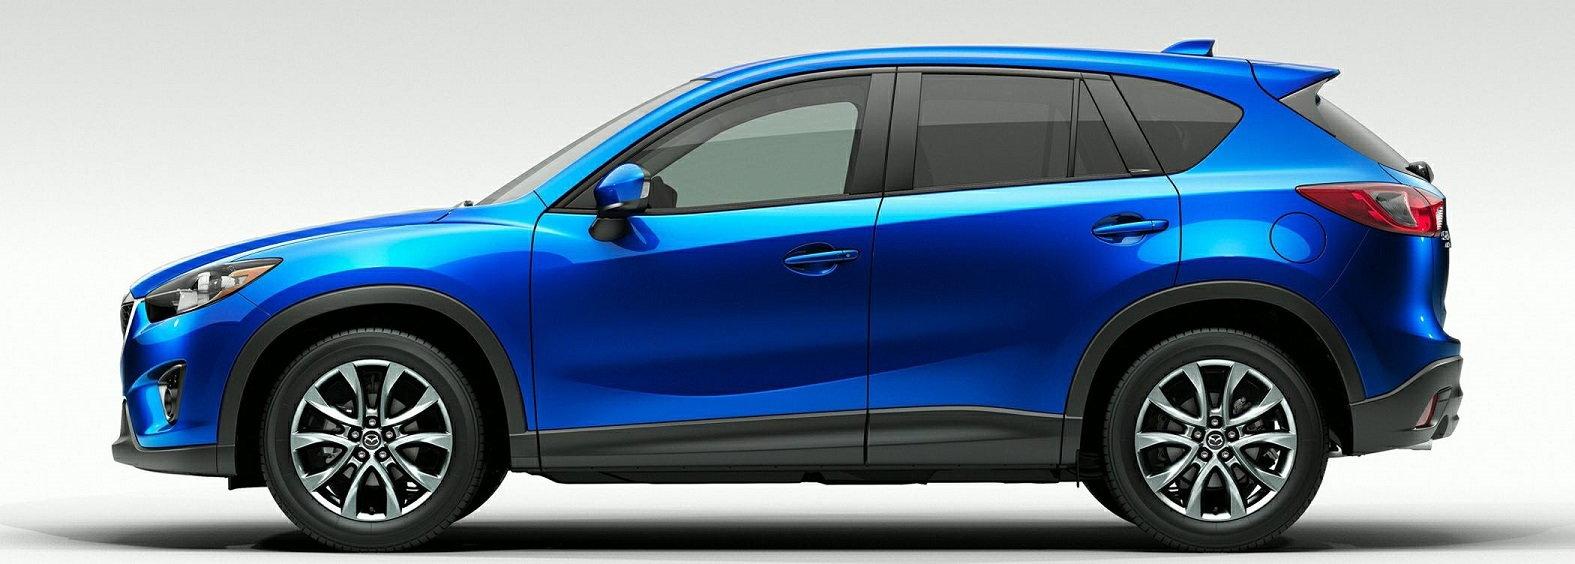 Allianz Extended Used Car Warranty